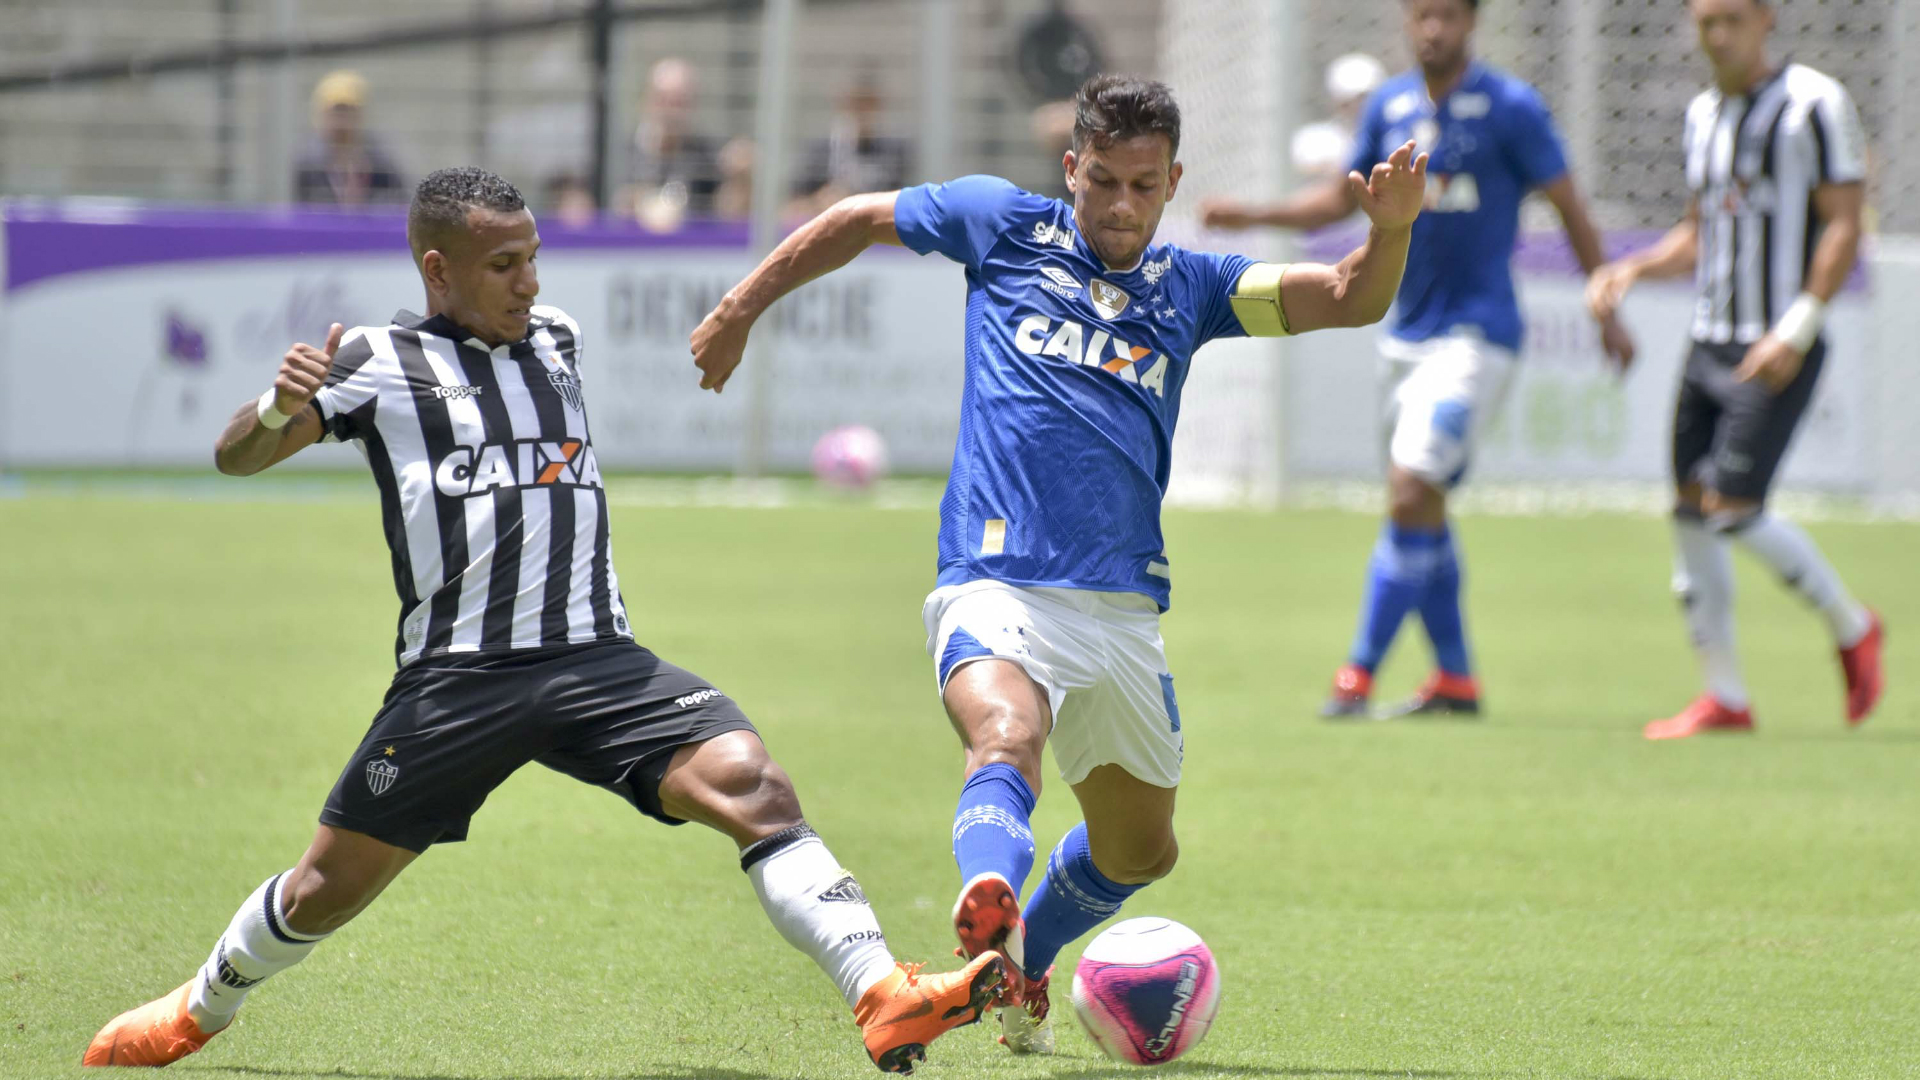 Otero Henrique Atlético-MG Cruzeiro Campeonato Mineiro 04032018